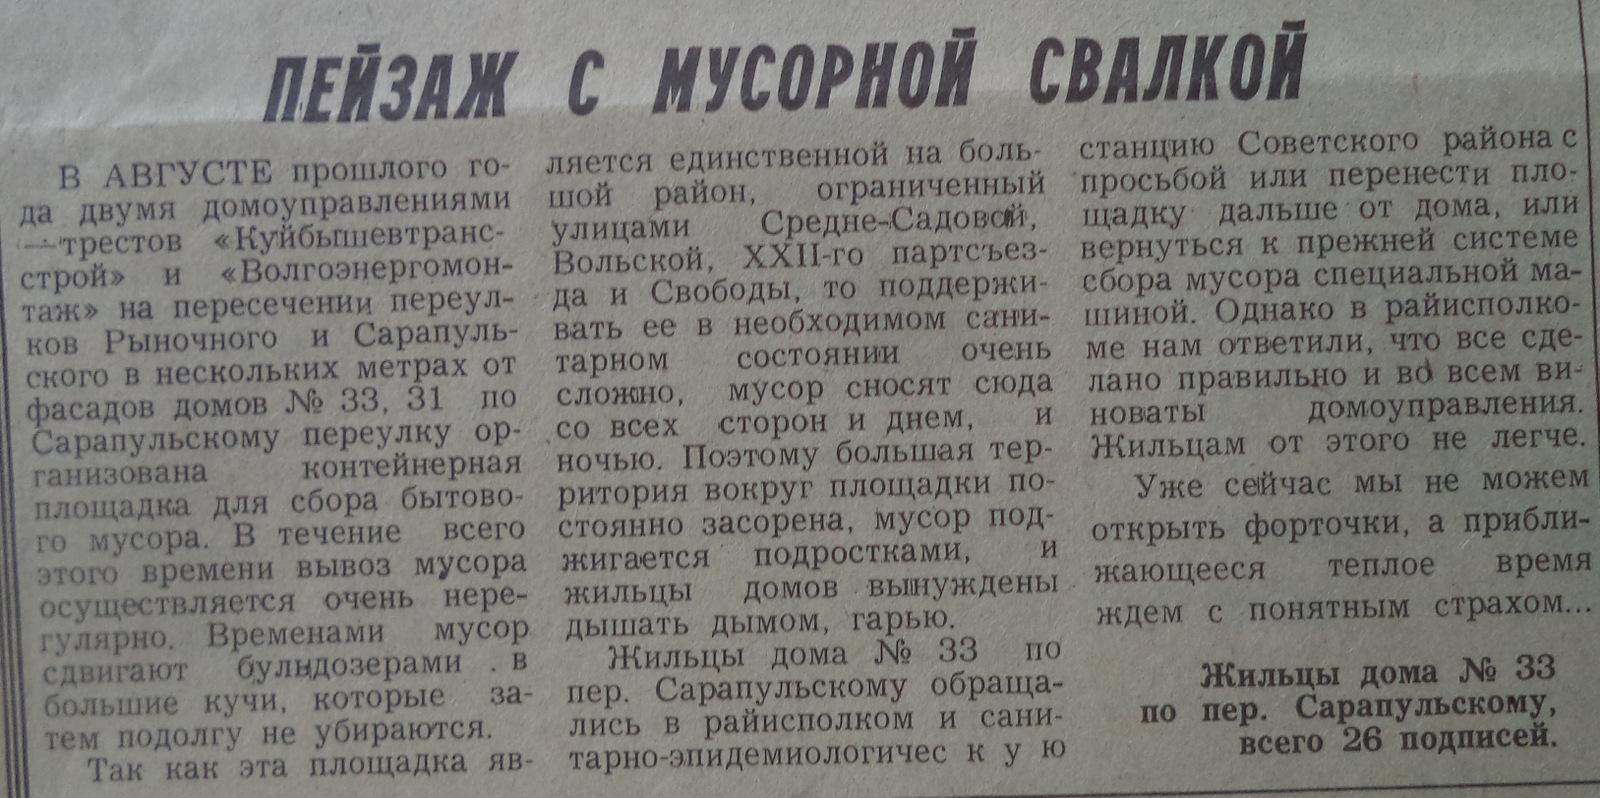 Сарапульский-ФОТО-14-ВЗя-1987-04-07-неблаг-во по Сарапул. пер.-33